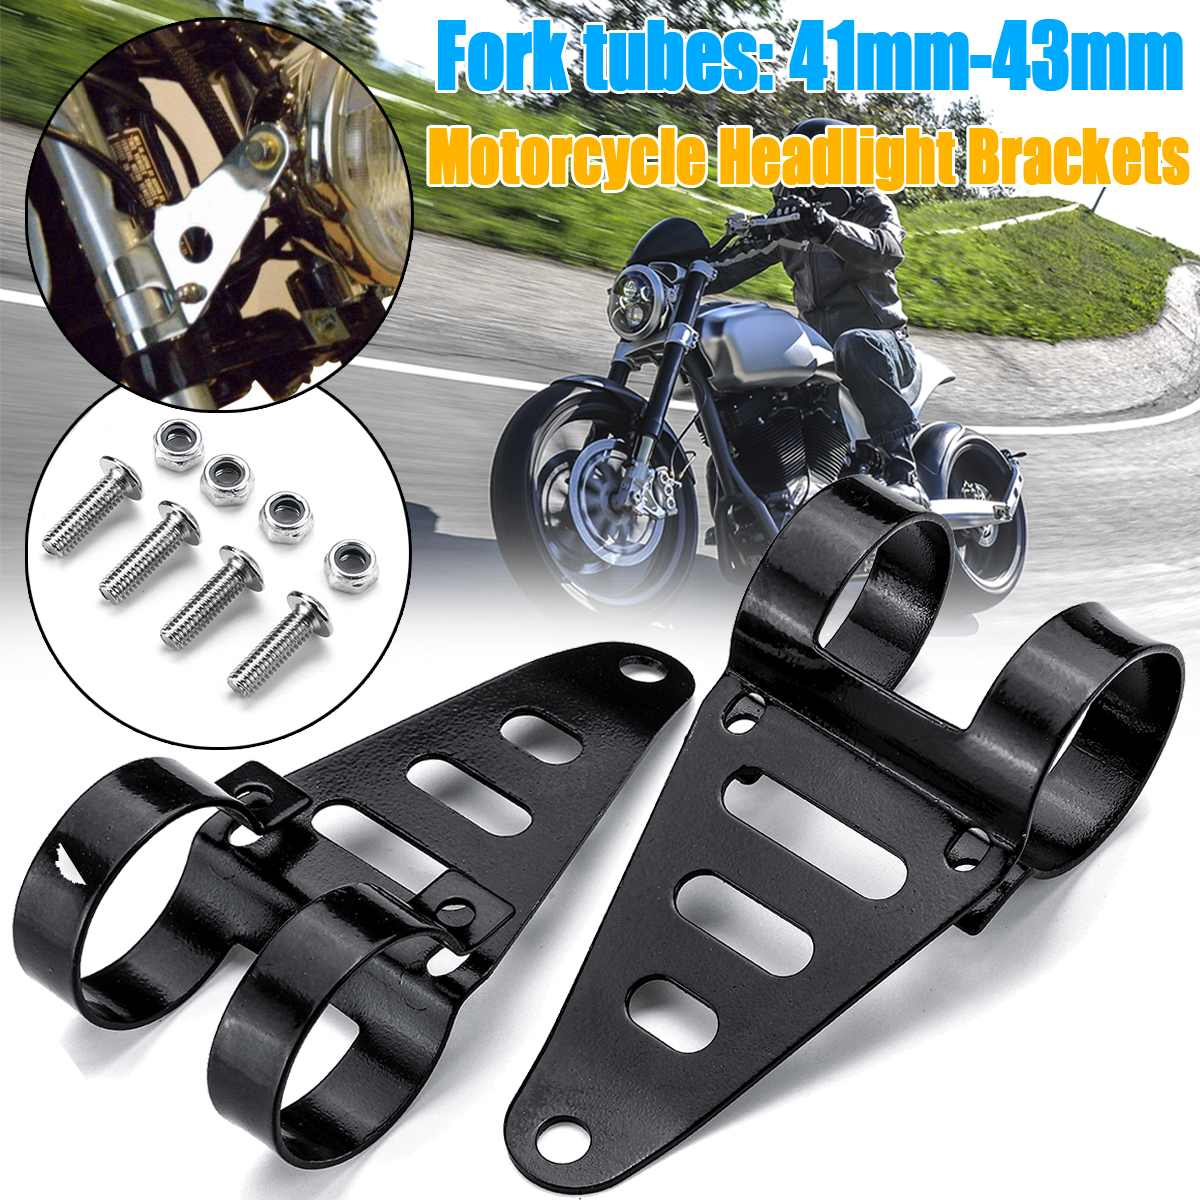 Universal  41-43mm Motorcycle Headlight Mount Brackets Fork Tube Mount Clamp Bracket Holder Adjustable Easy To Install